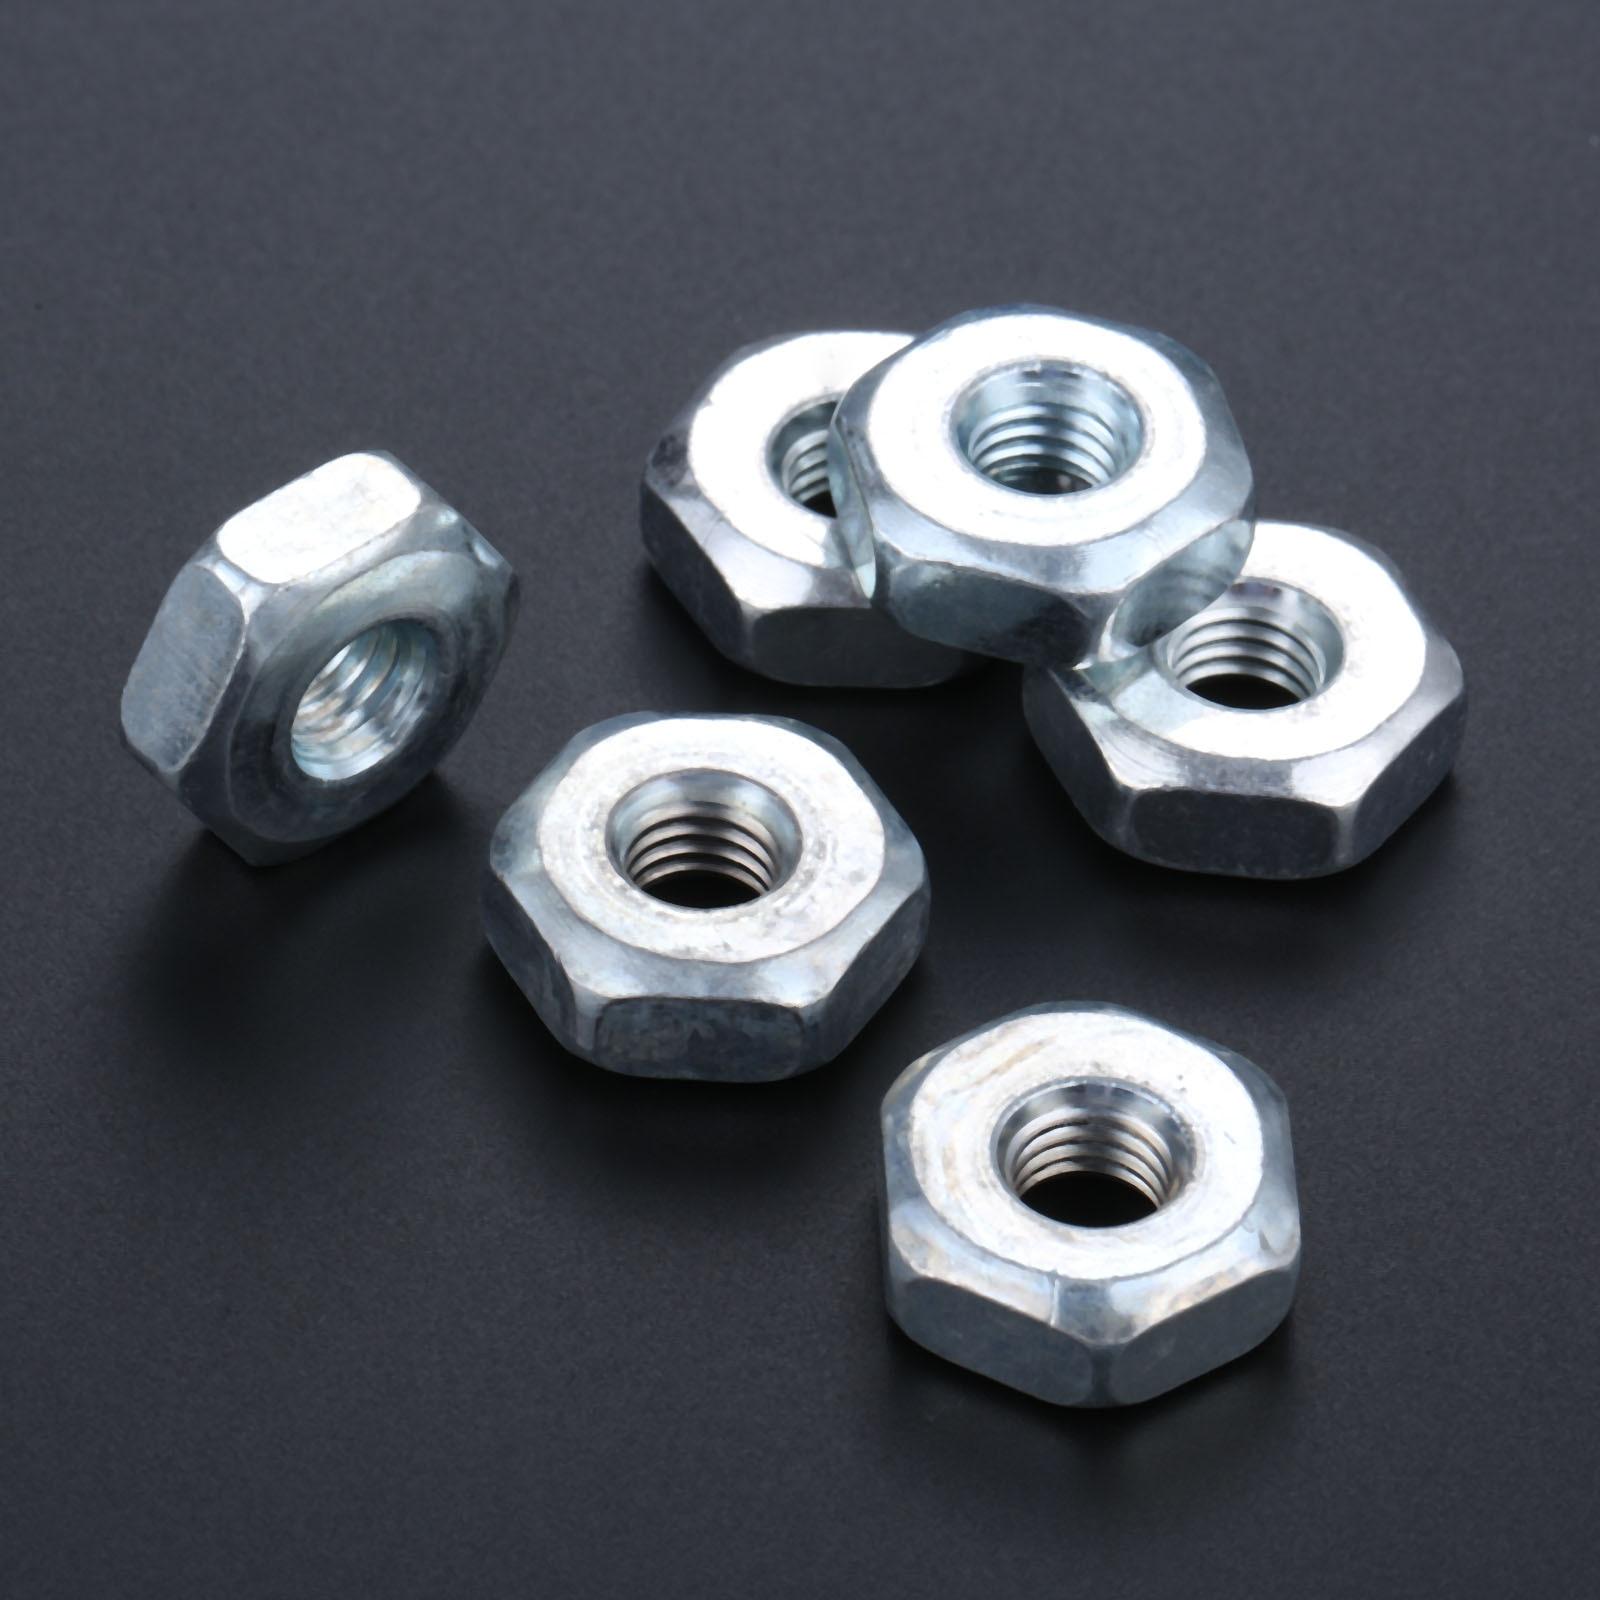 DRELD 6pcs Sprocket Cover Bar Nut For STIHL MS240 MS260 MS270 MS280 MS290 MS310 MS390 MS340 MS360 MS360C MS440 MS460 Chainsaw